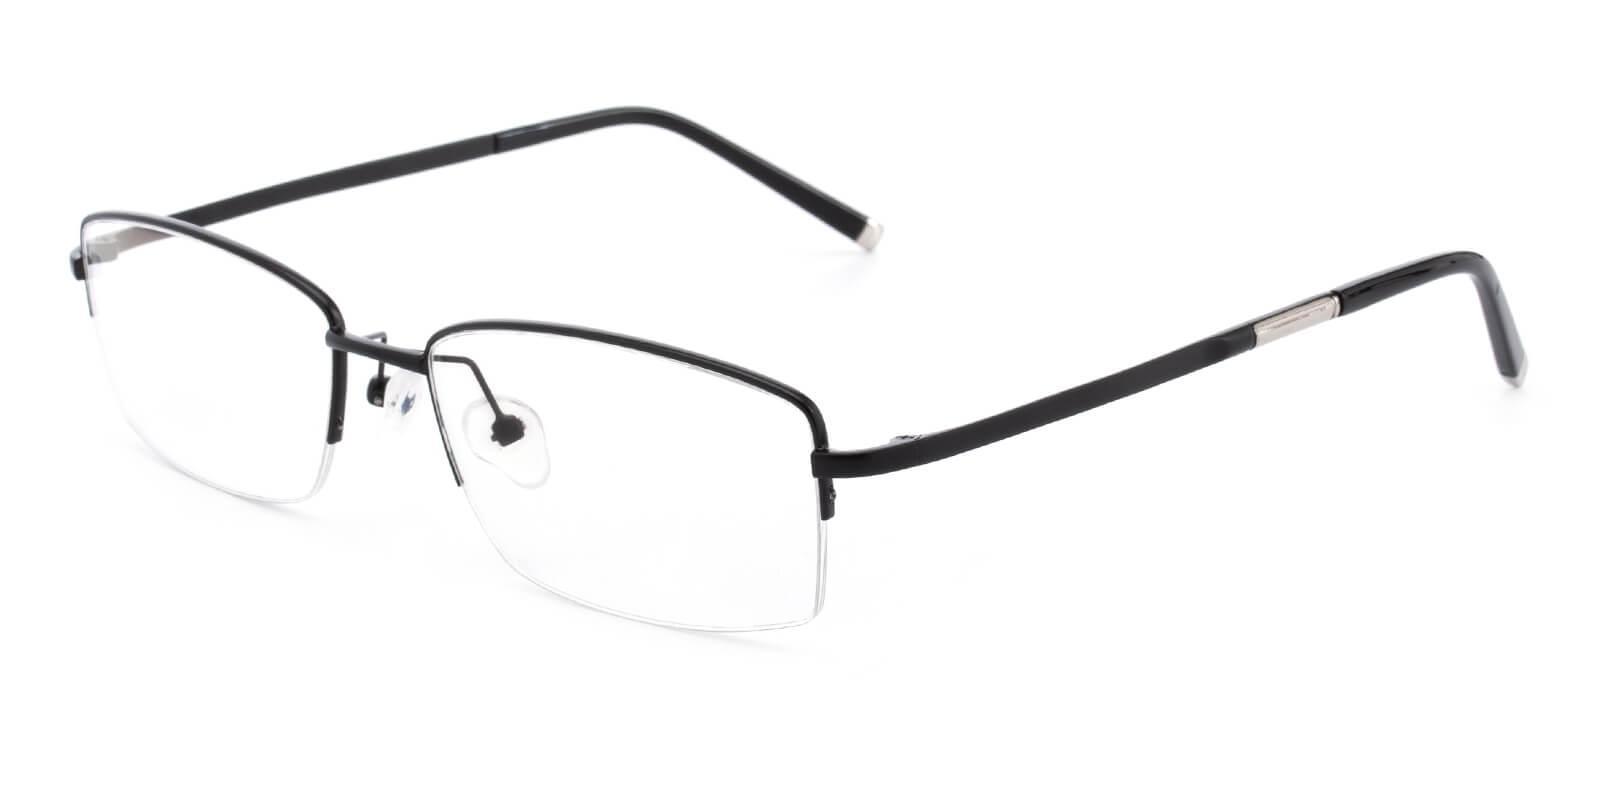 Revelino-Black-Rectangle-Titanium-Eyeglasses-detail